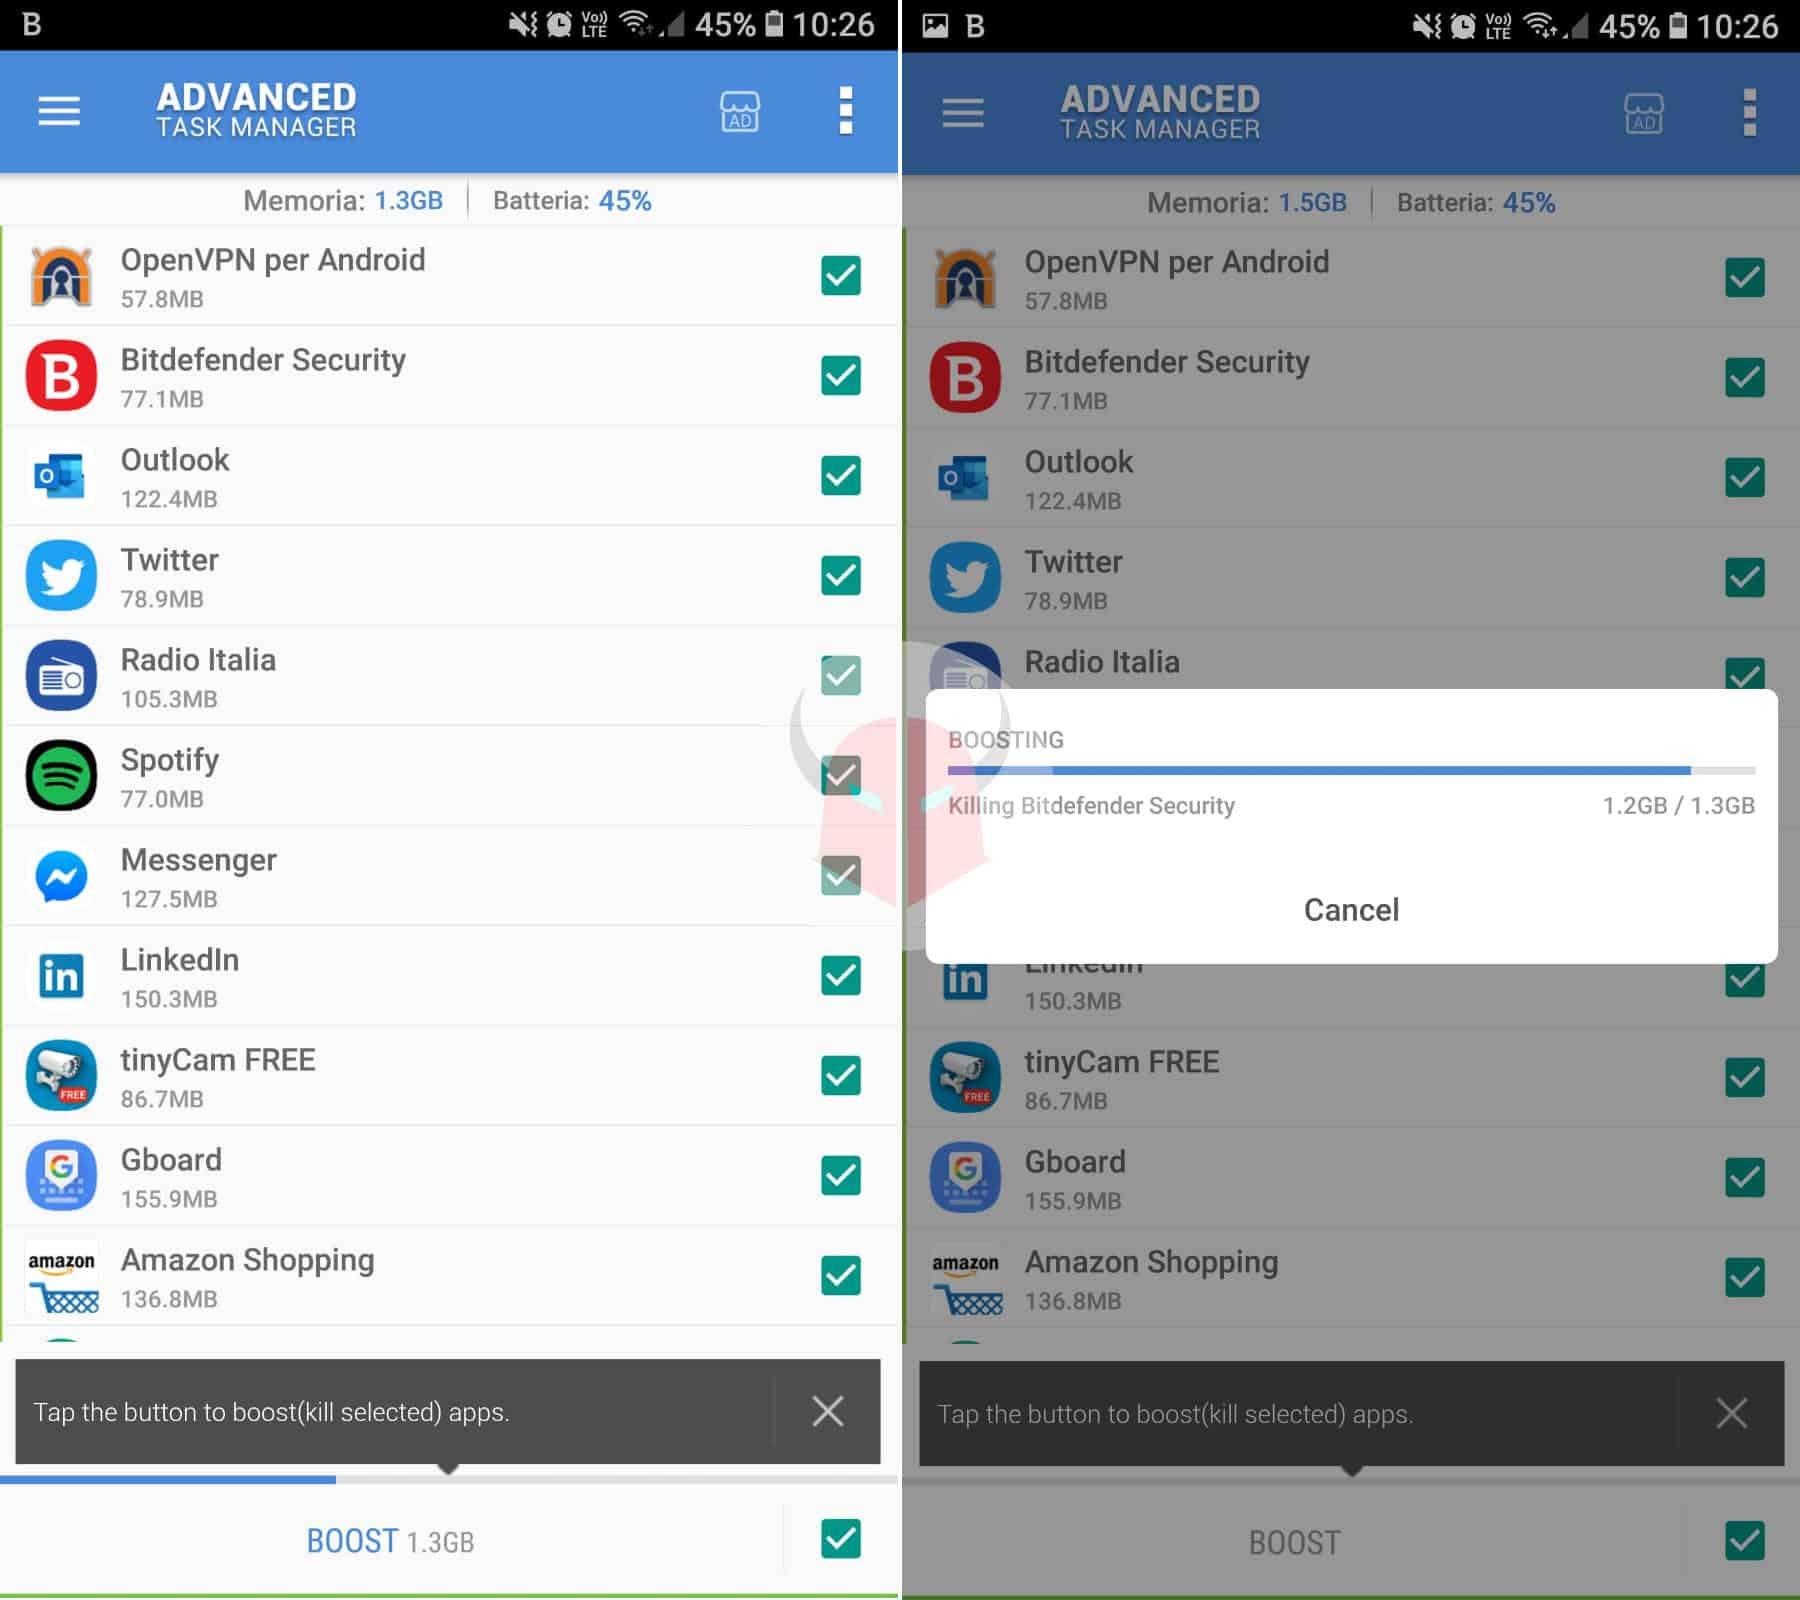 come aumentare durata batteria Android app Advanced Task Manager